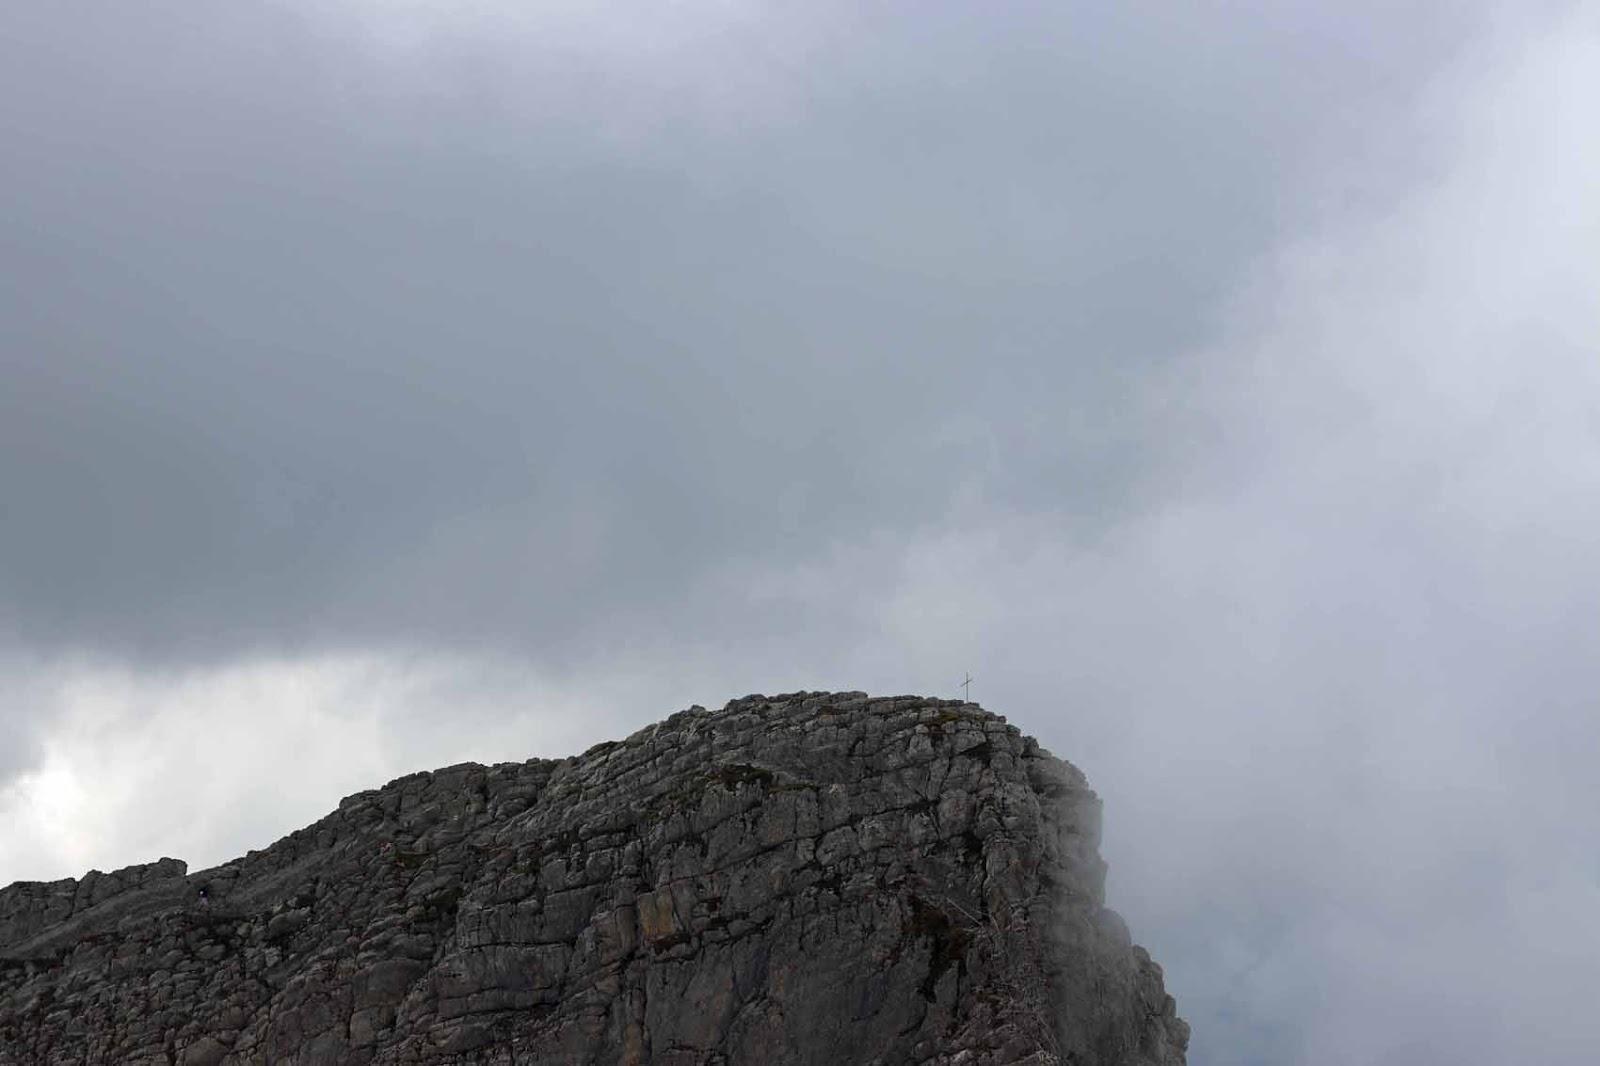 Risti vuoren huipulla